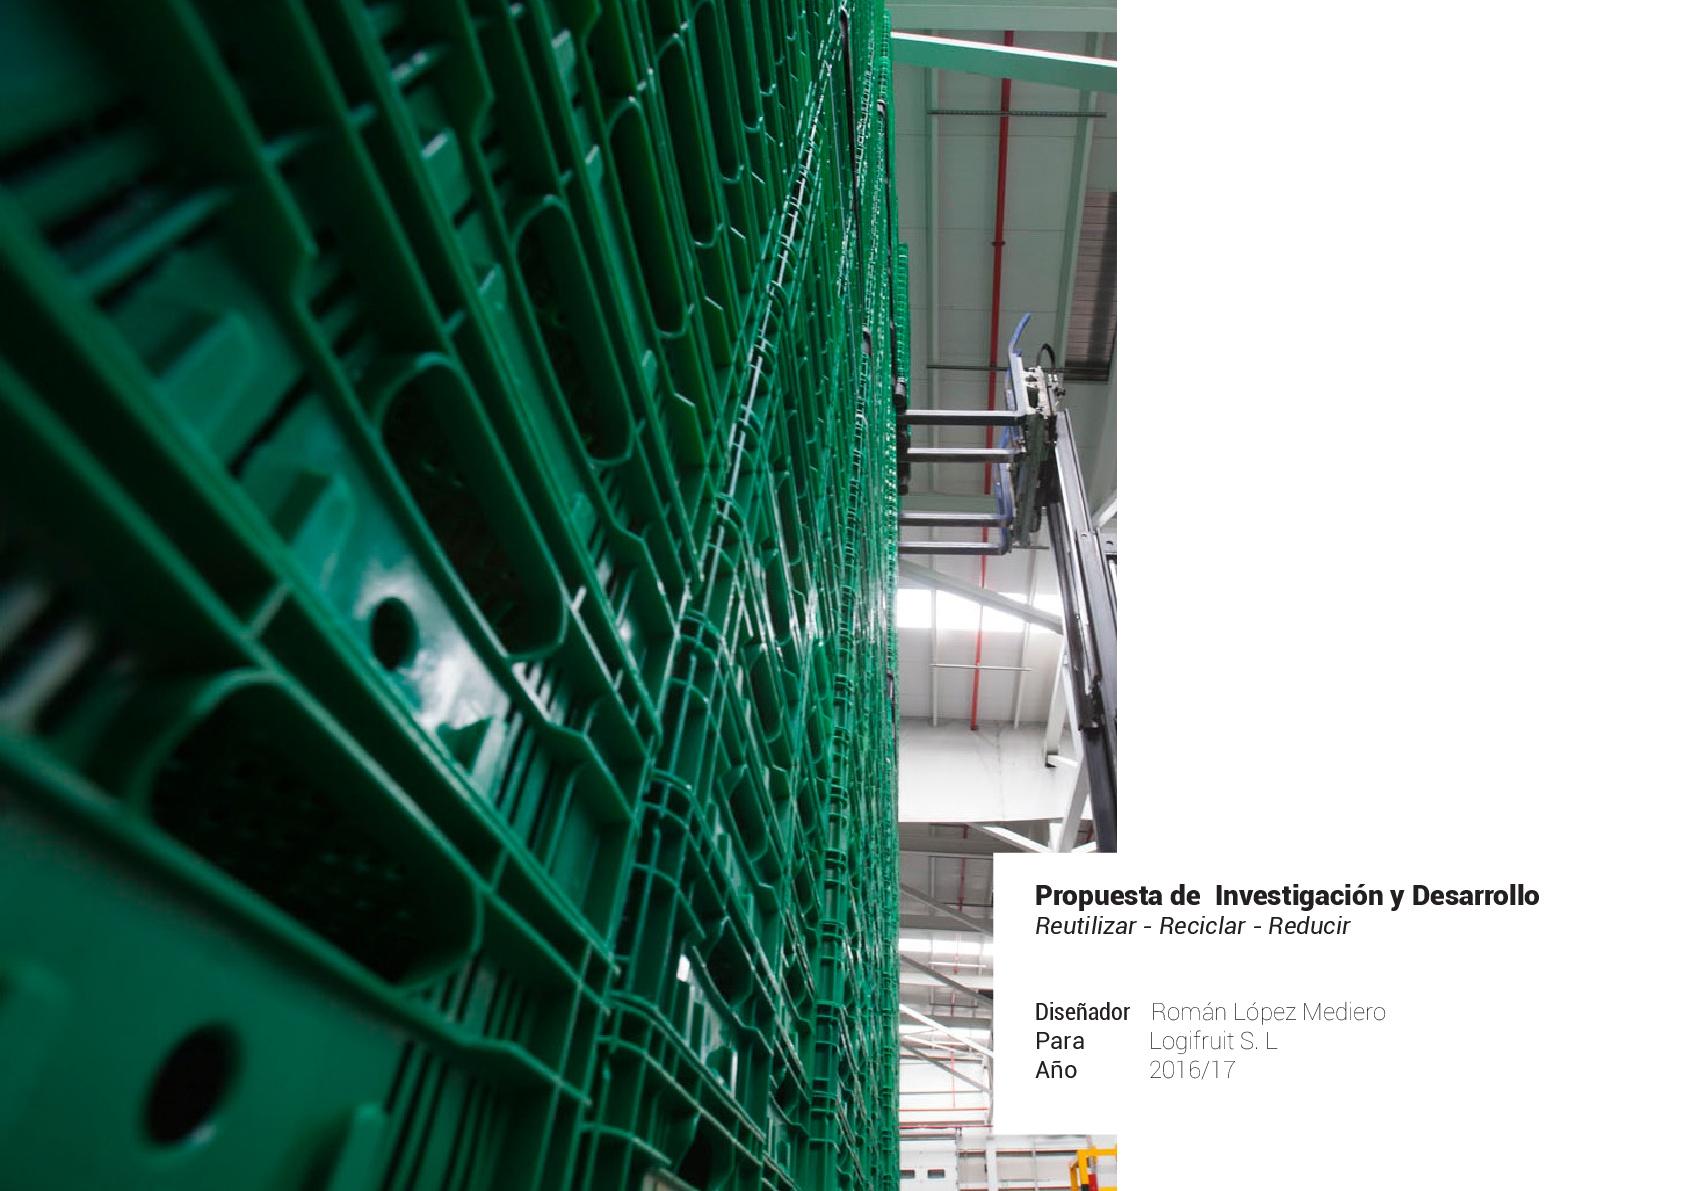 PROPUESTA-LOGIFRUIT-001